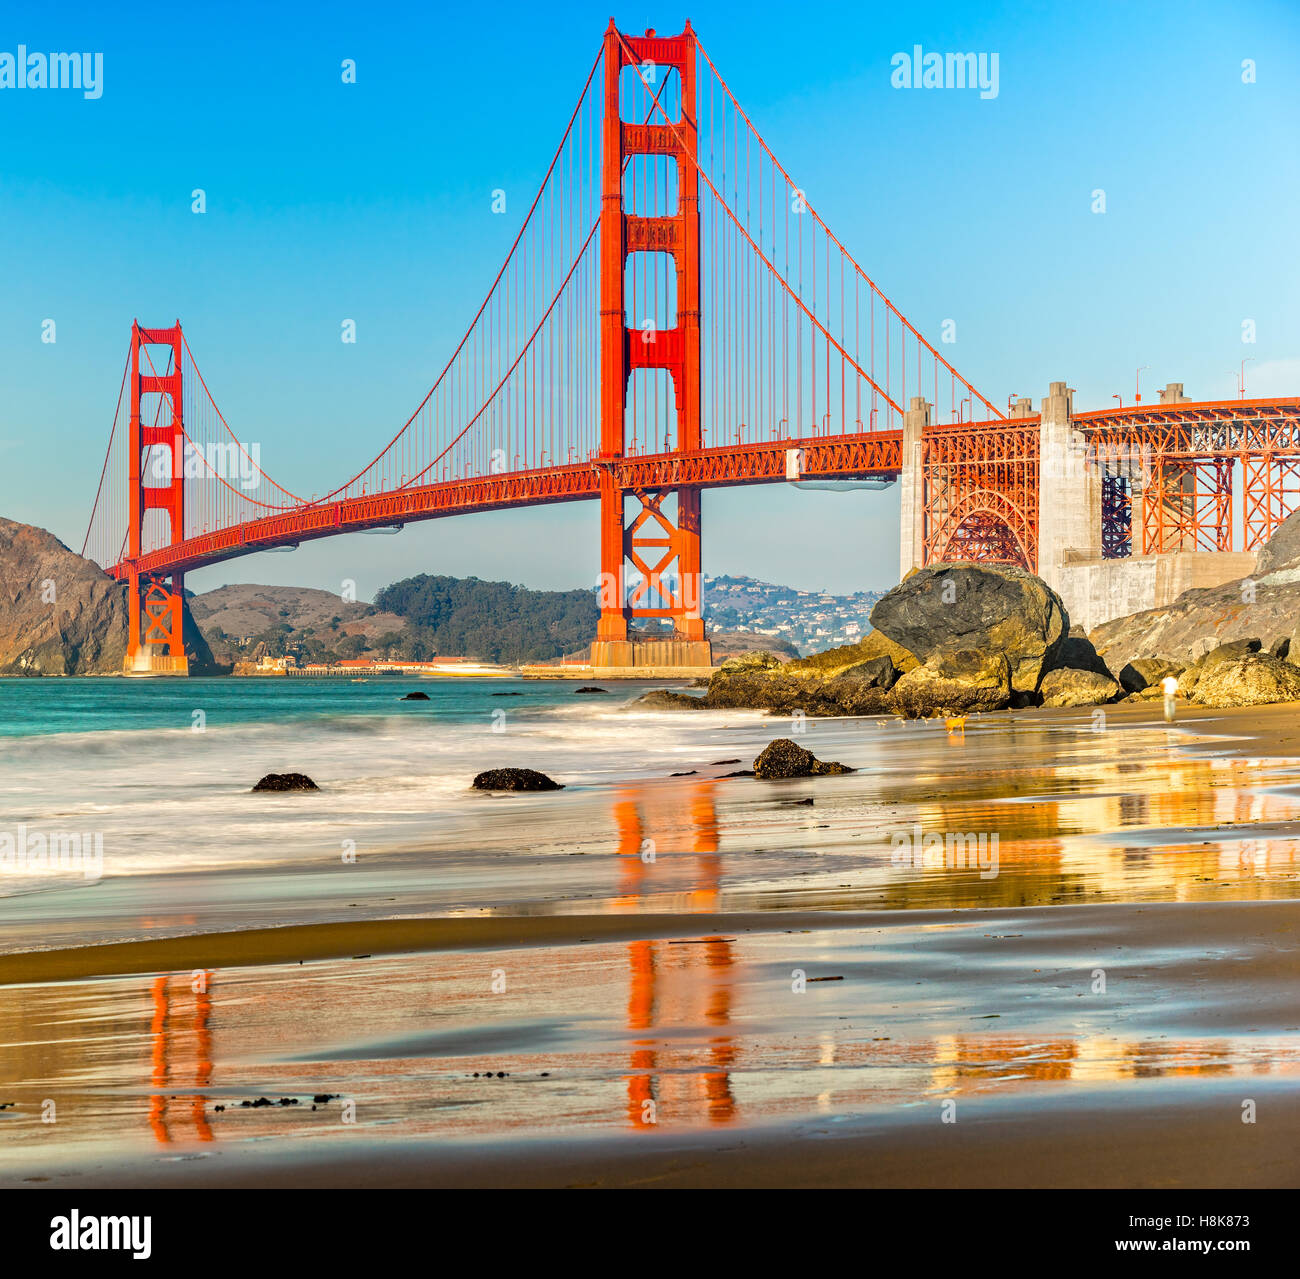 Golden Gate Bridge in San Francisco, California, USA. - Stock Image